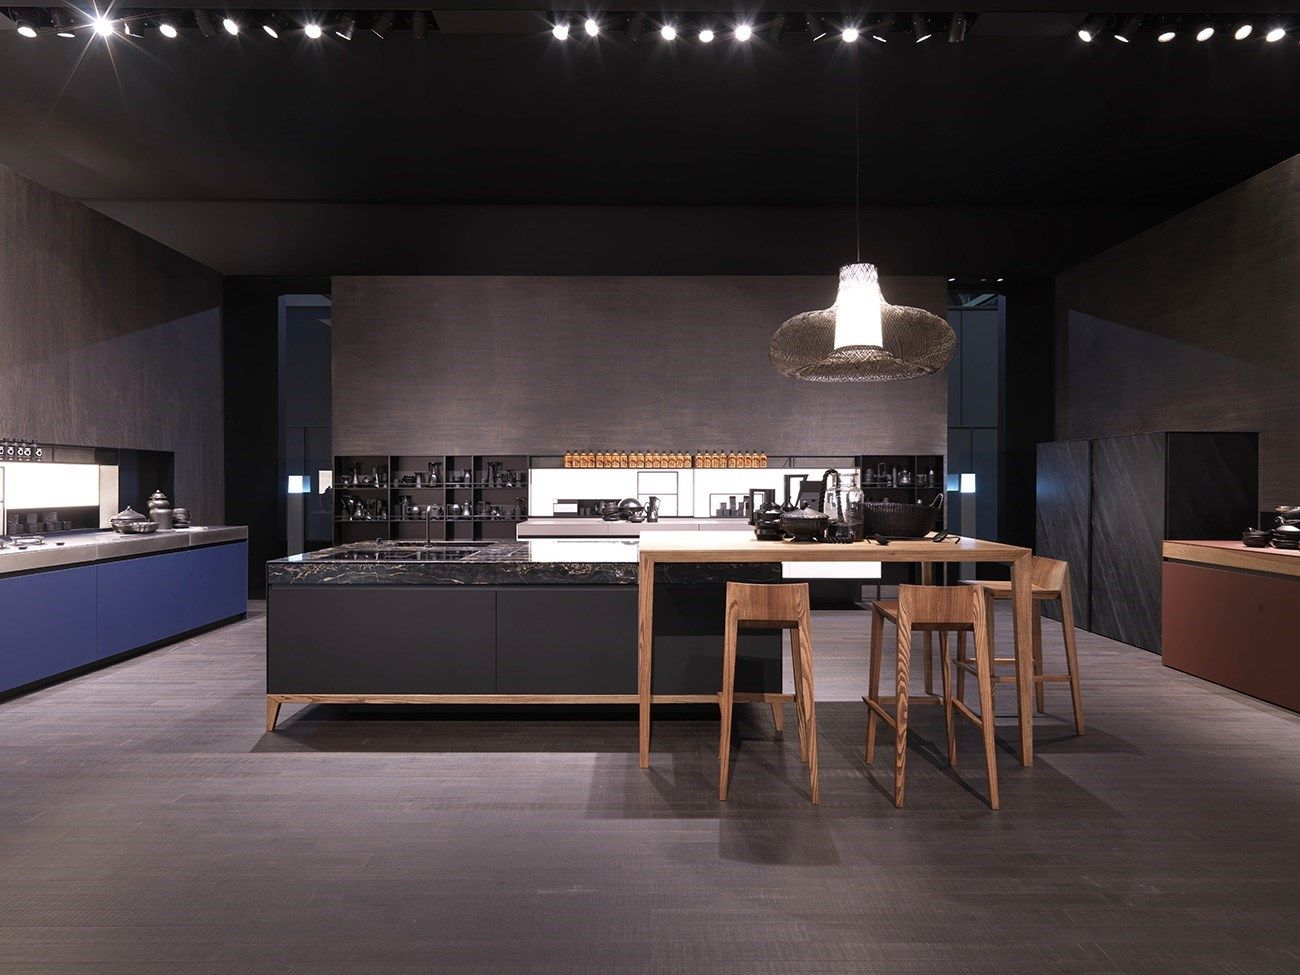 39 kitchen atmosphere 39 for Euromobil 02